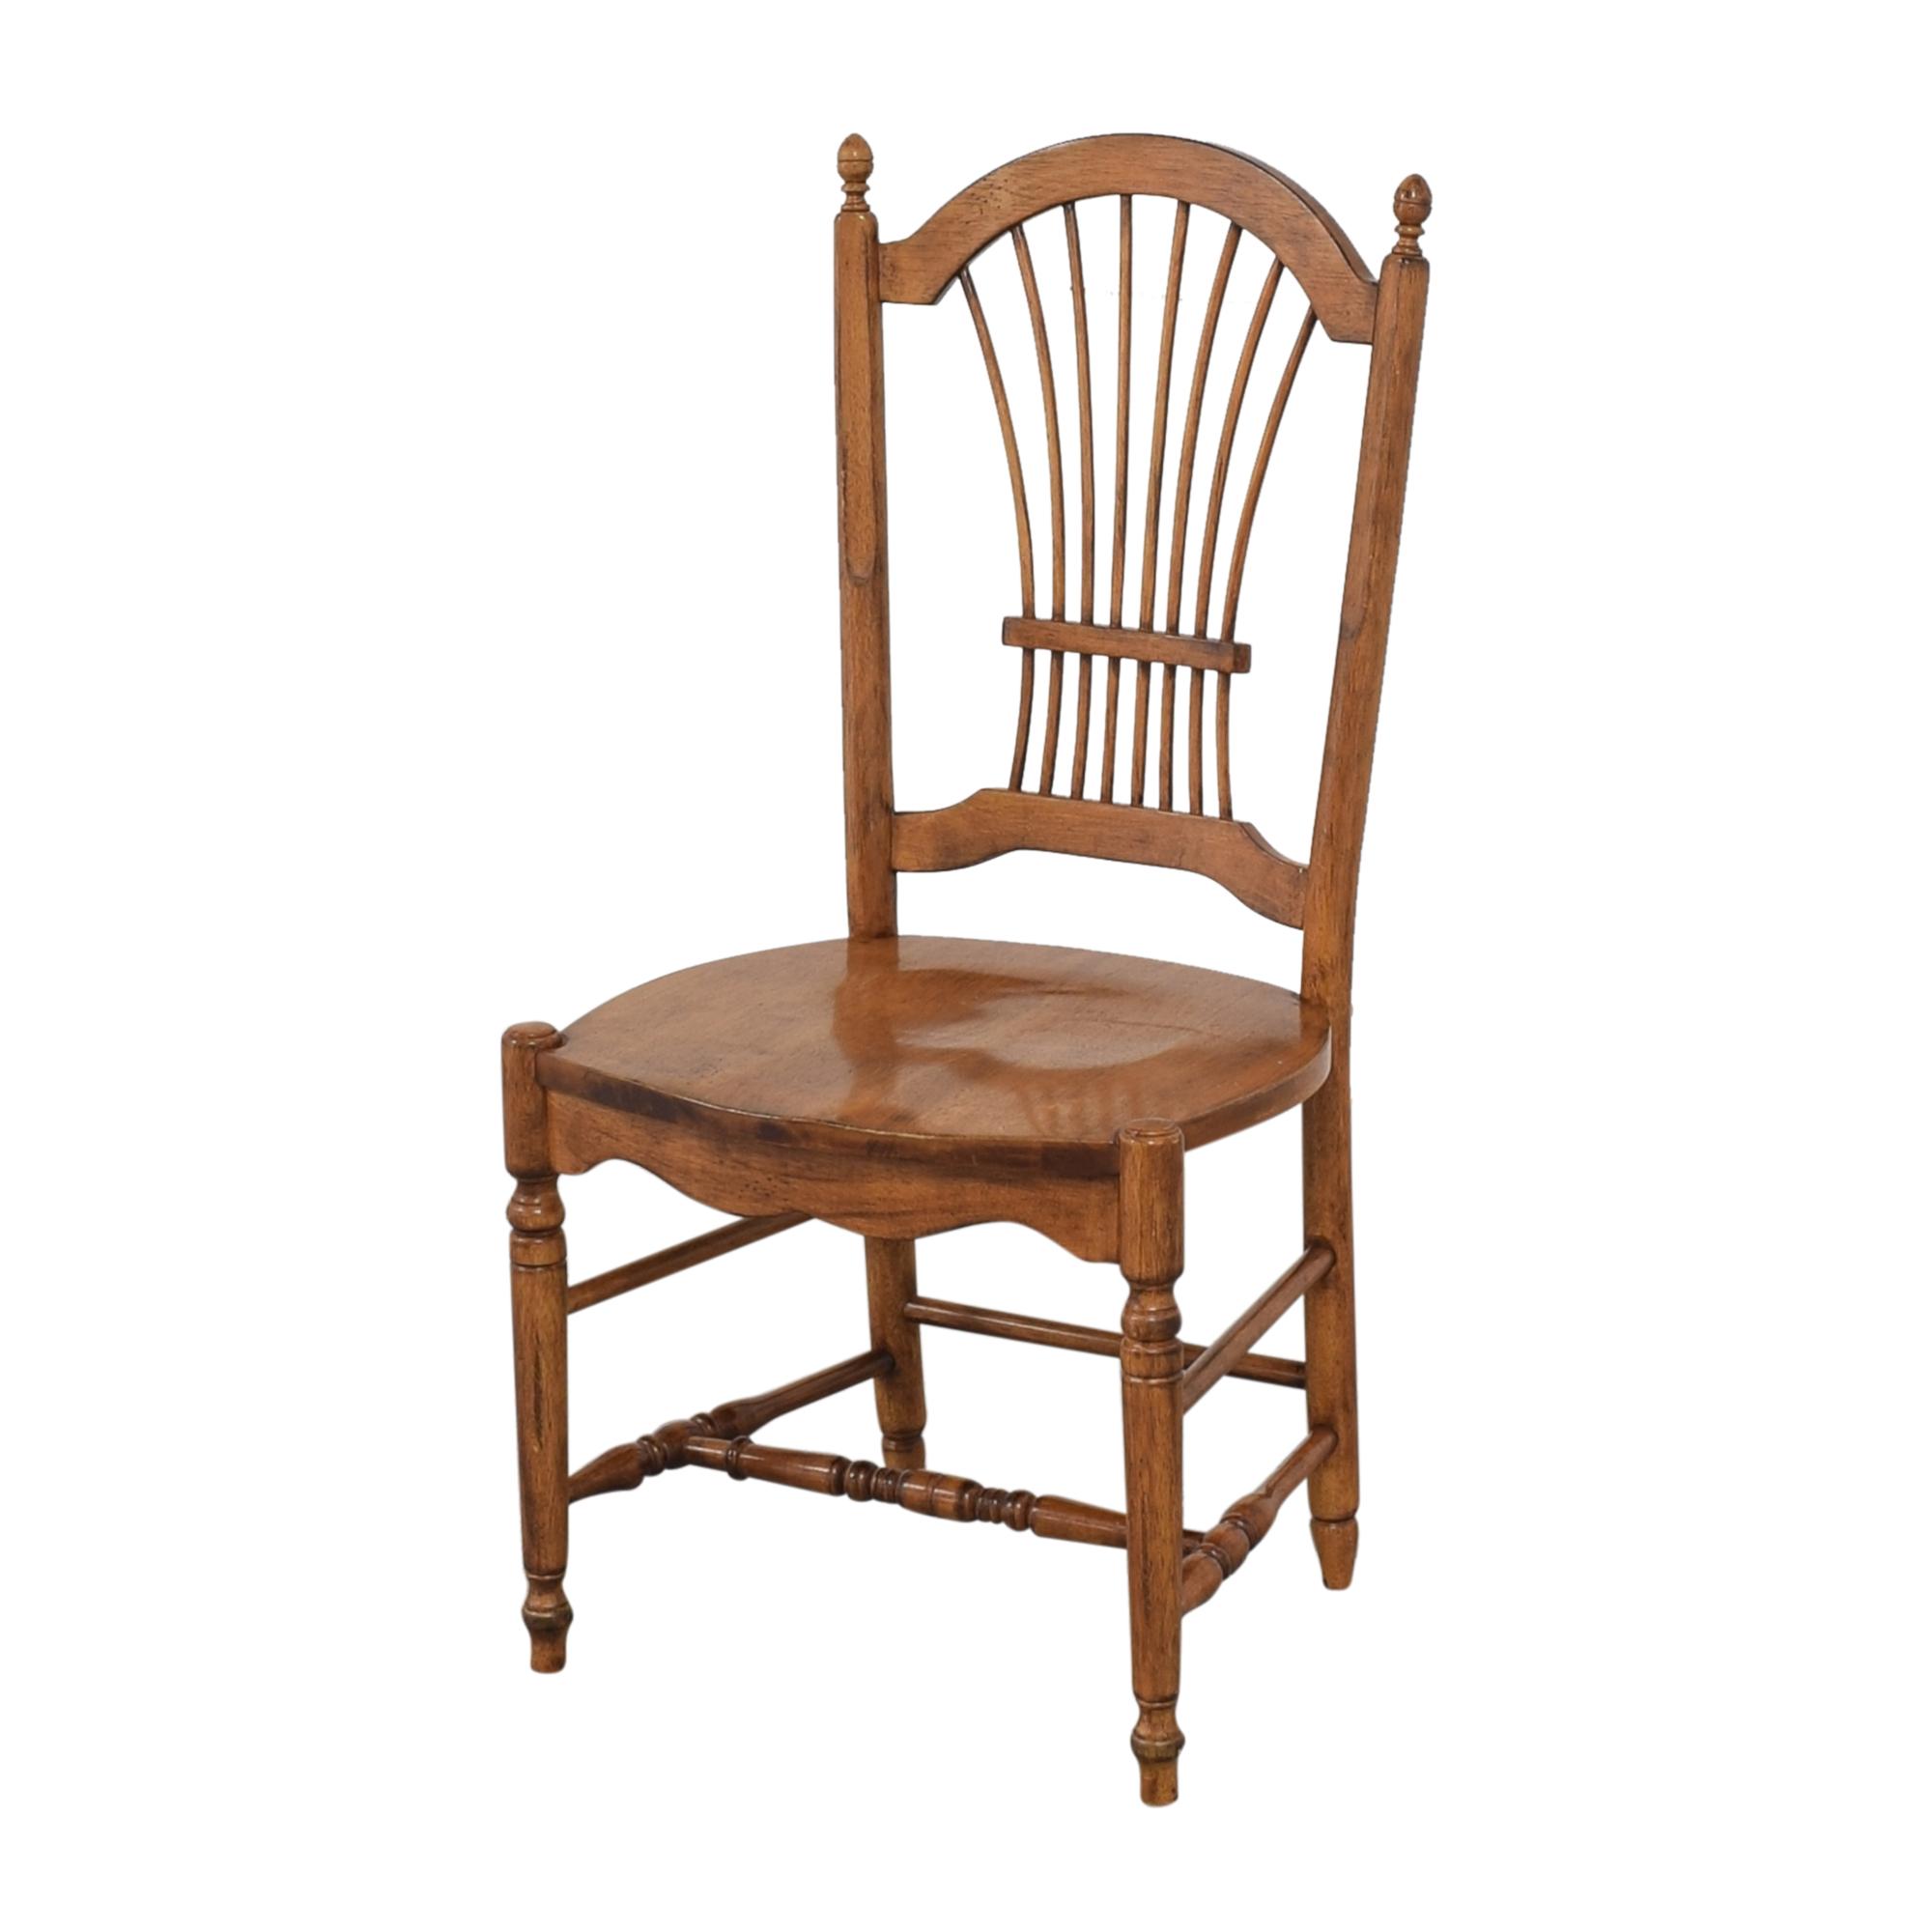 Drexel Drexel Sheaf Back Dining Chairs pa